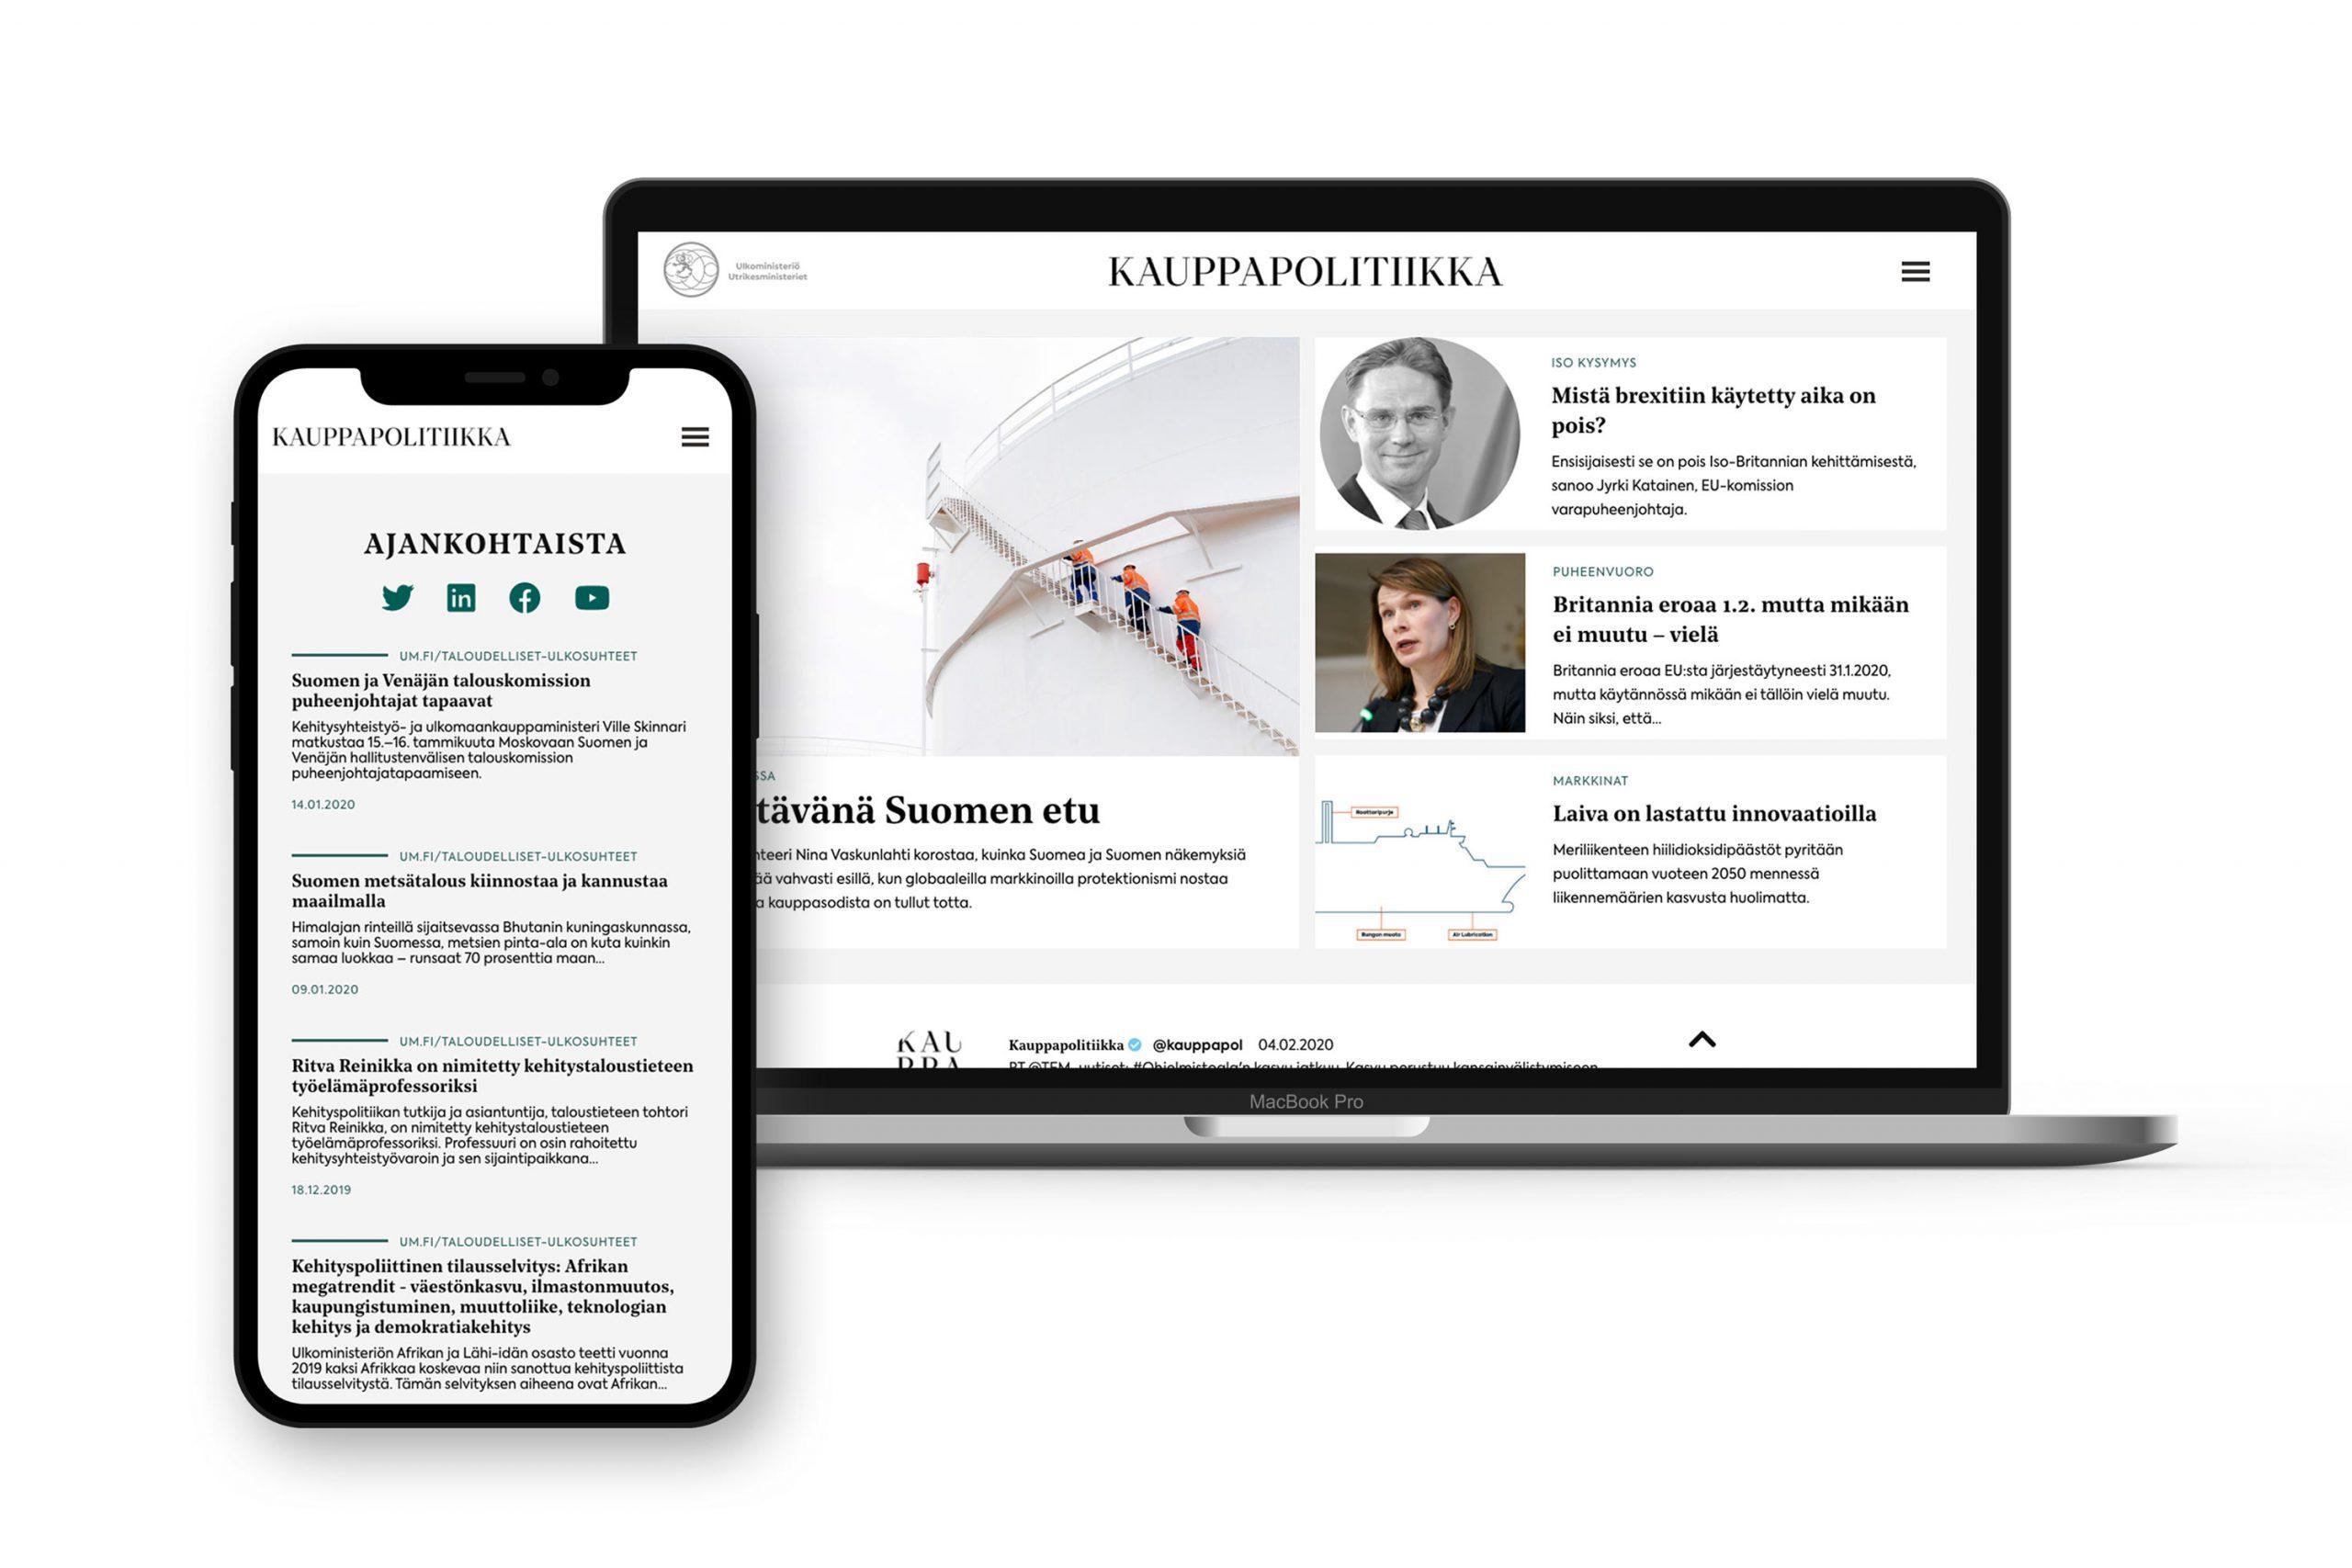 kauppapolitiikka-macbook-iphone-scaled-1.jpg